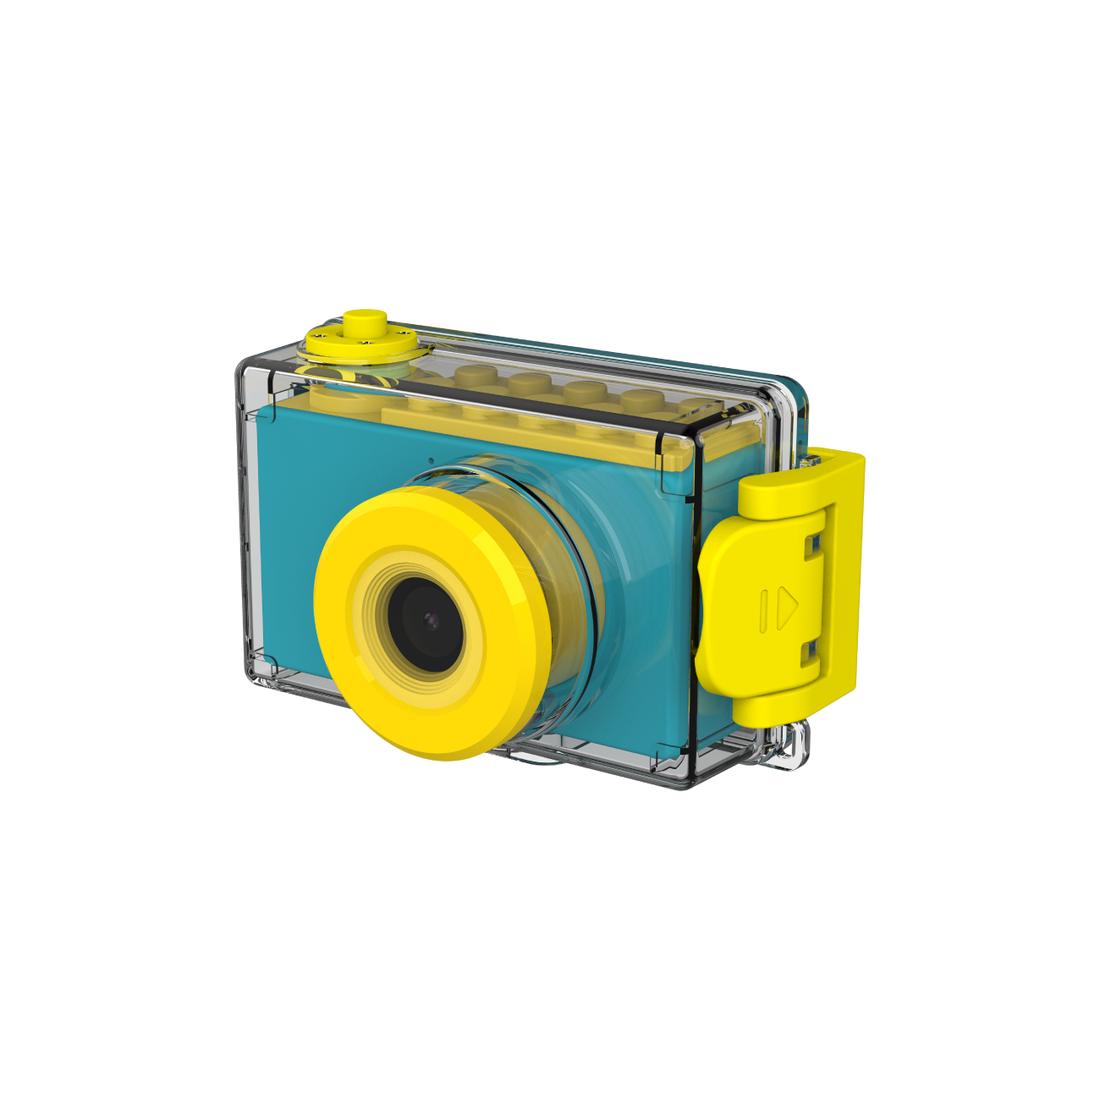 camera2-blue-6_1100x